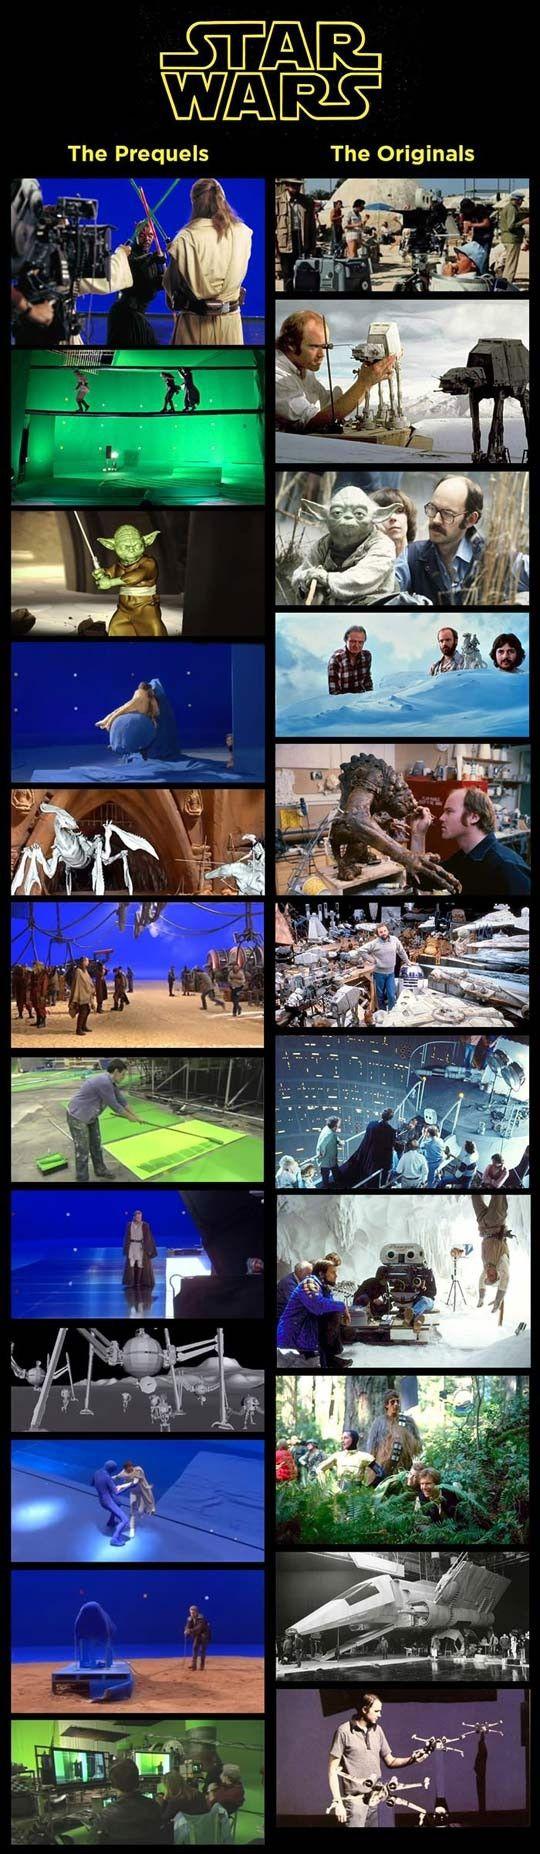 STAR WARS Production Photos - The Originals Vs. The Prequels — GeekTyrant